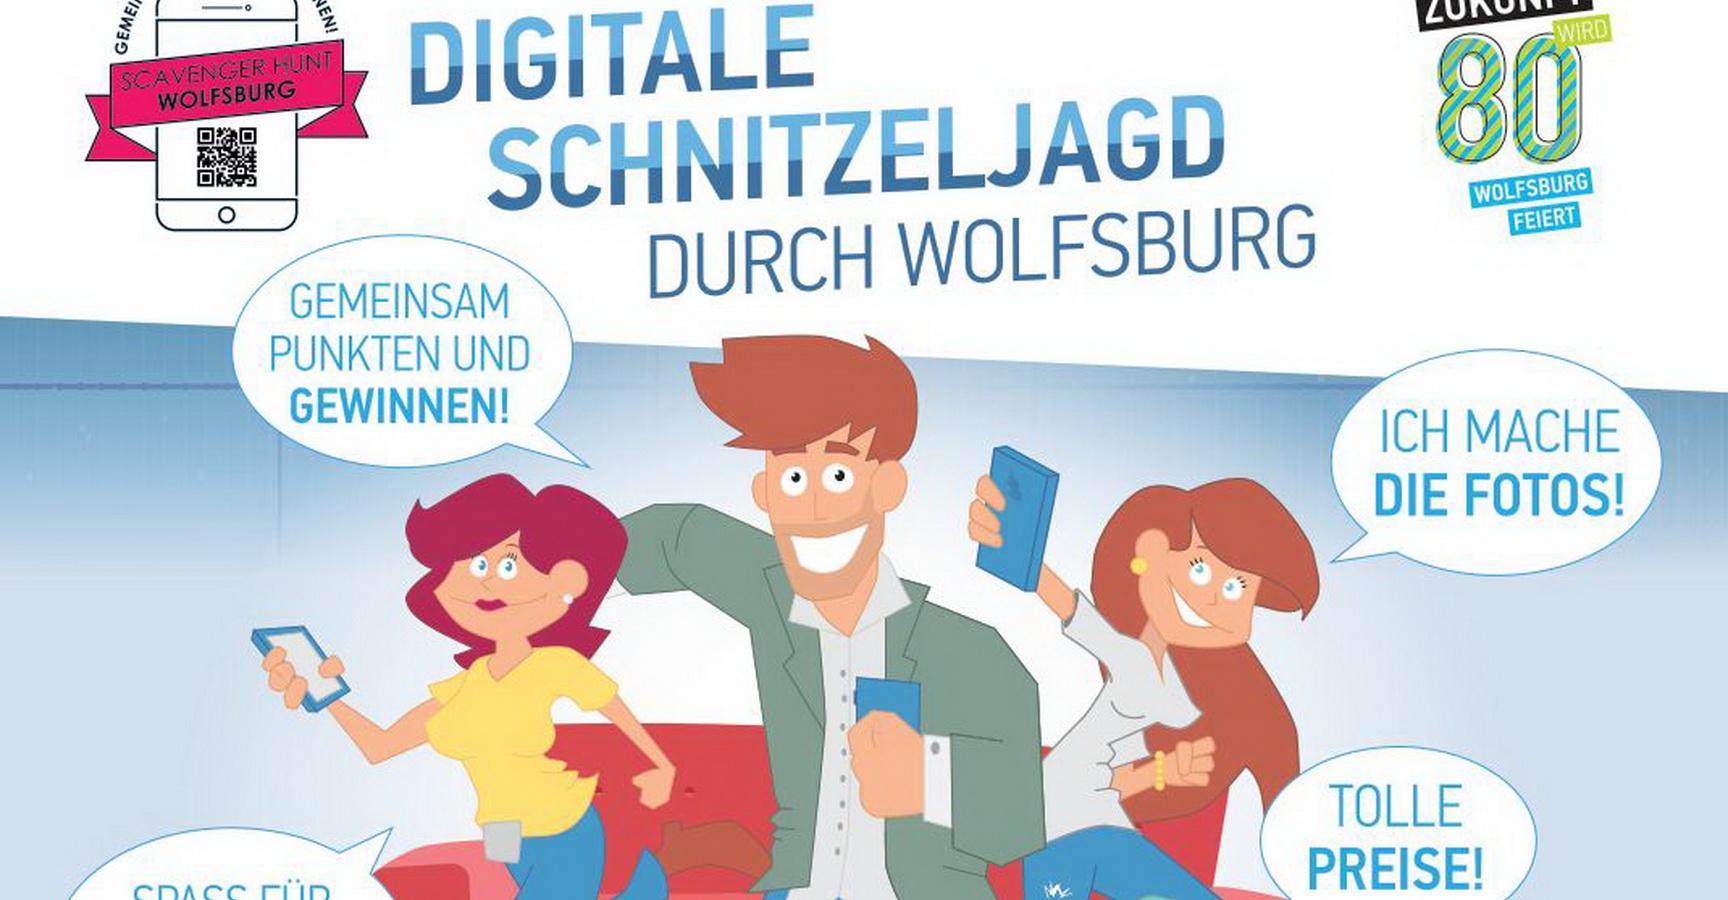 Digitale Schnitzeljagd in Wolfsburg 9. Mai bis 25. Mai 2018 - Tolle ...